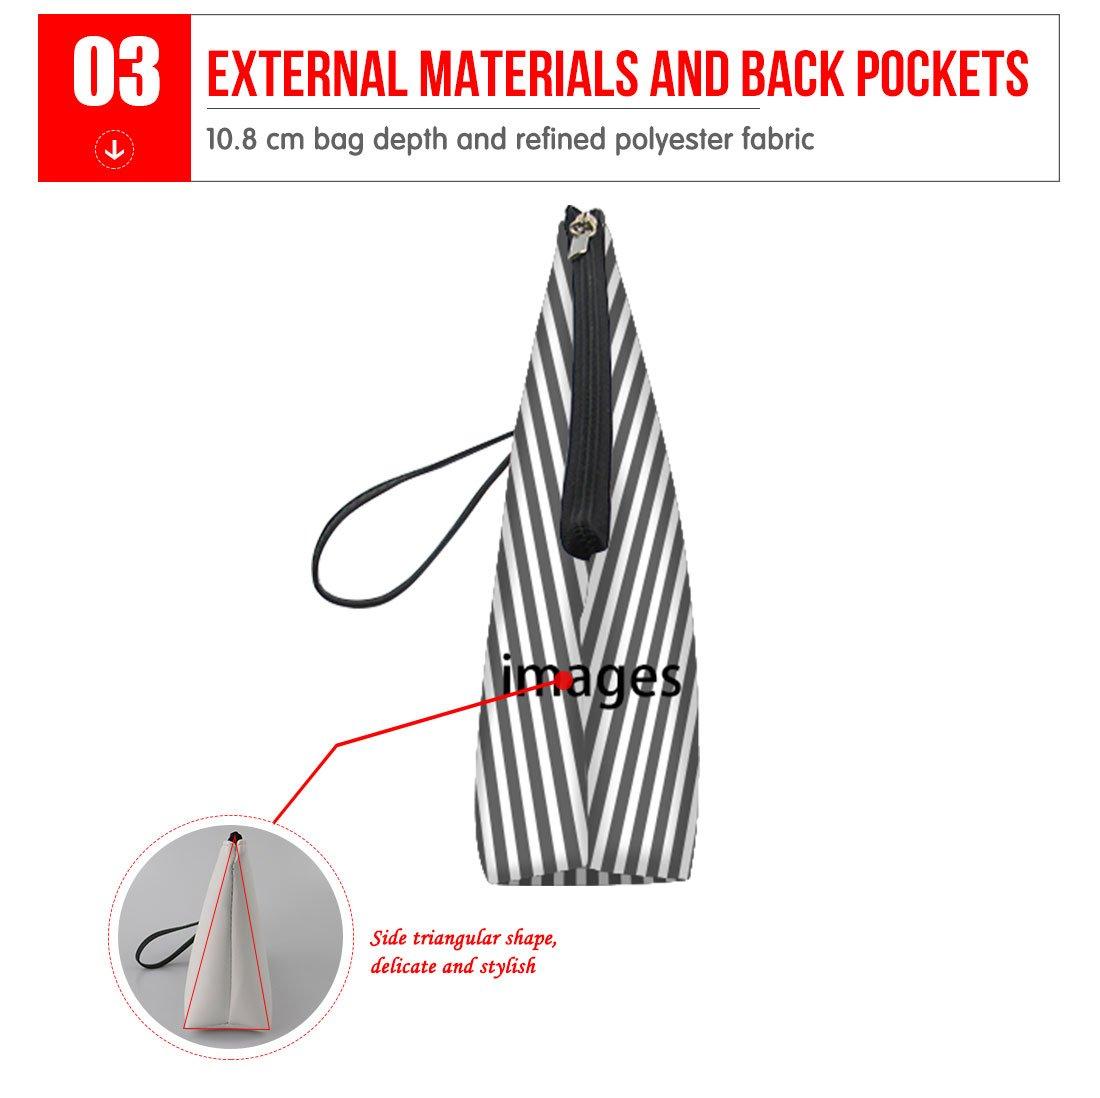 Mumeson Floral Schnauzer Pattern Trapezoid Make Up Bags Clutch Handbags by Mumeson (Image #4)